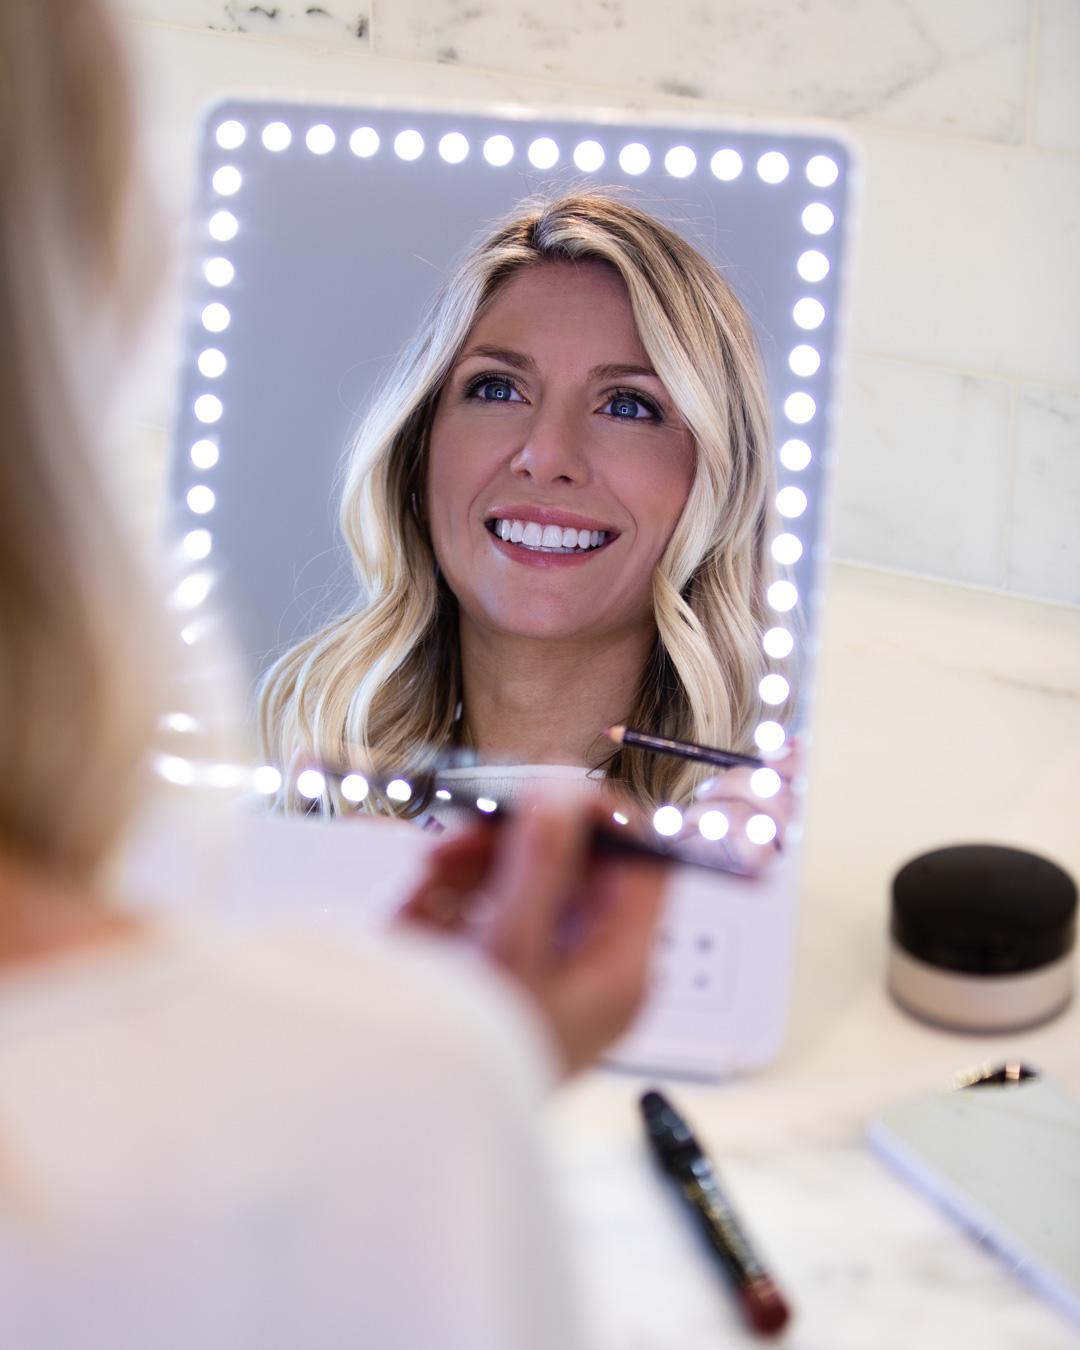 Glamcor RIKI SKINNY Makeup Mirror